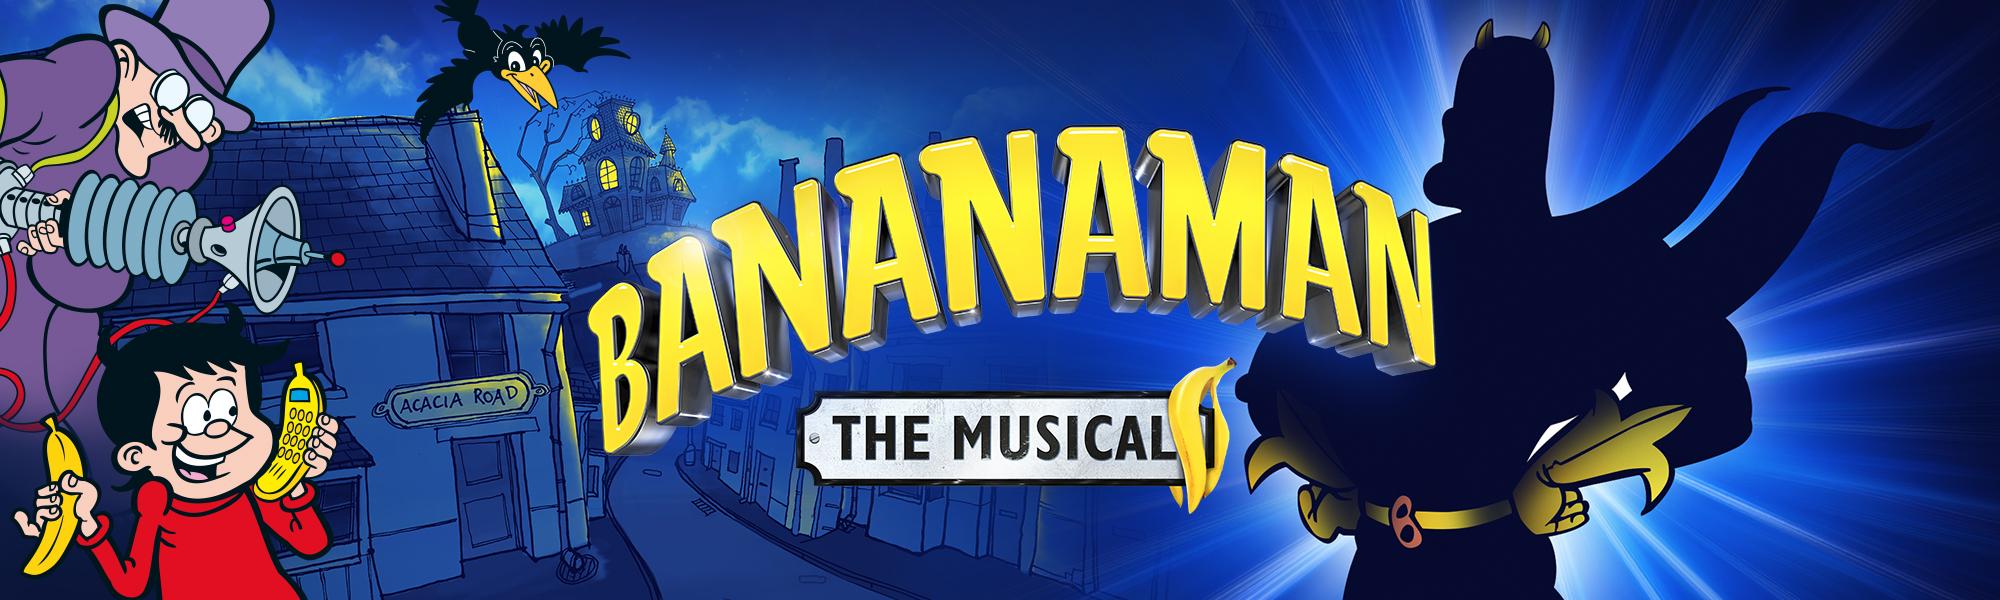 BananamanTheMusical